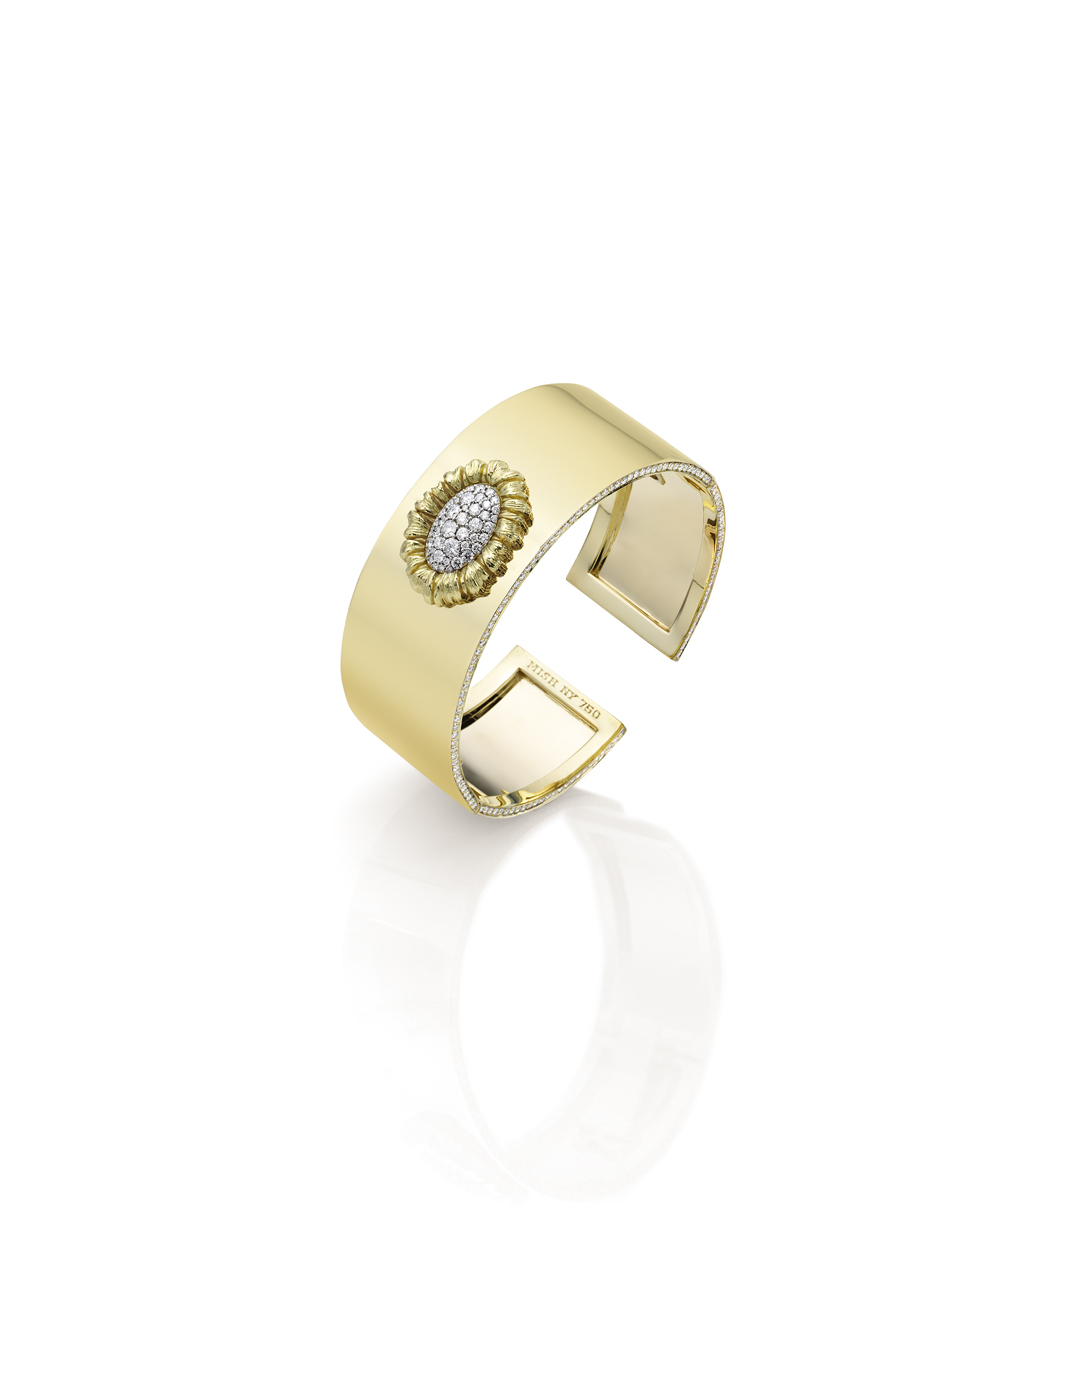 mish_jewelry_product_Nigella-YG-Cuff-2